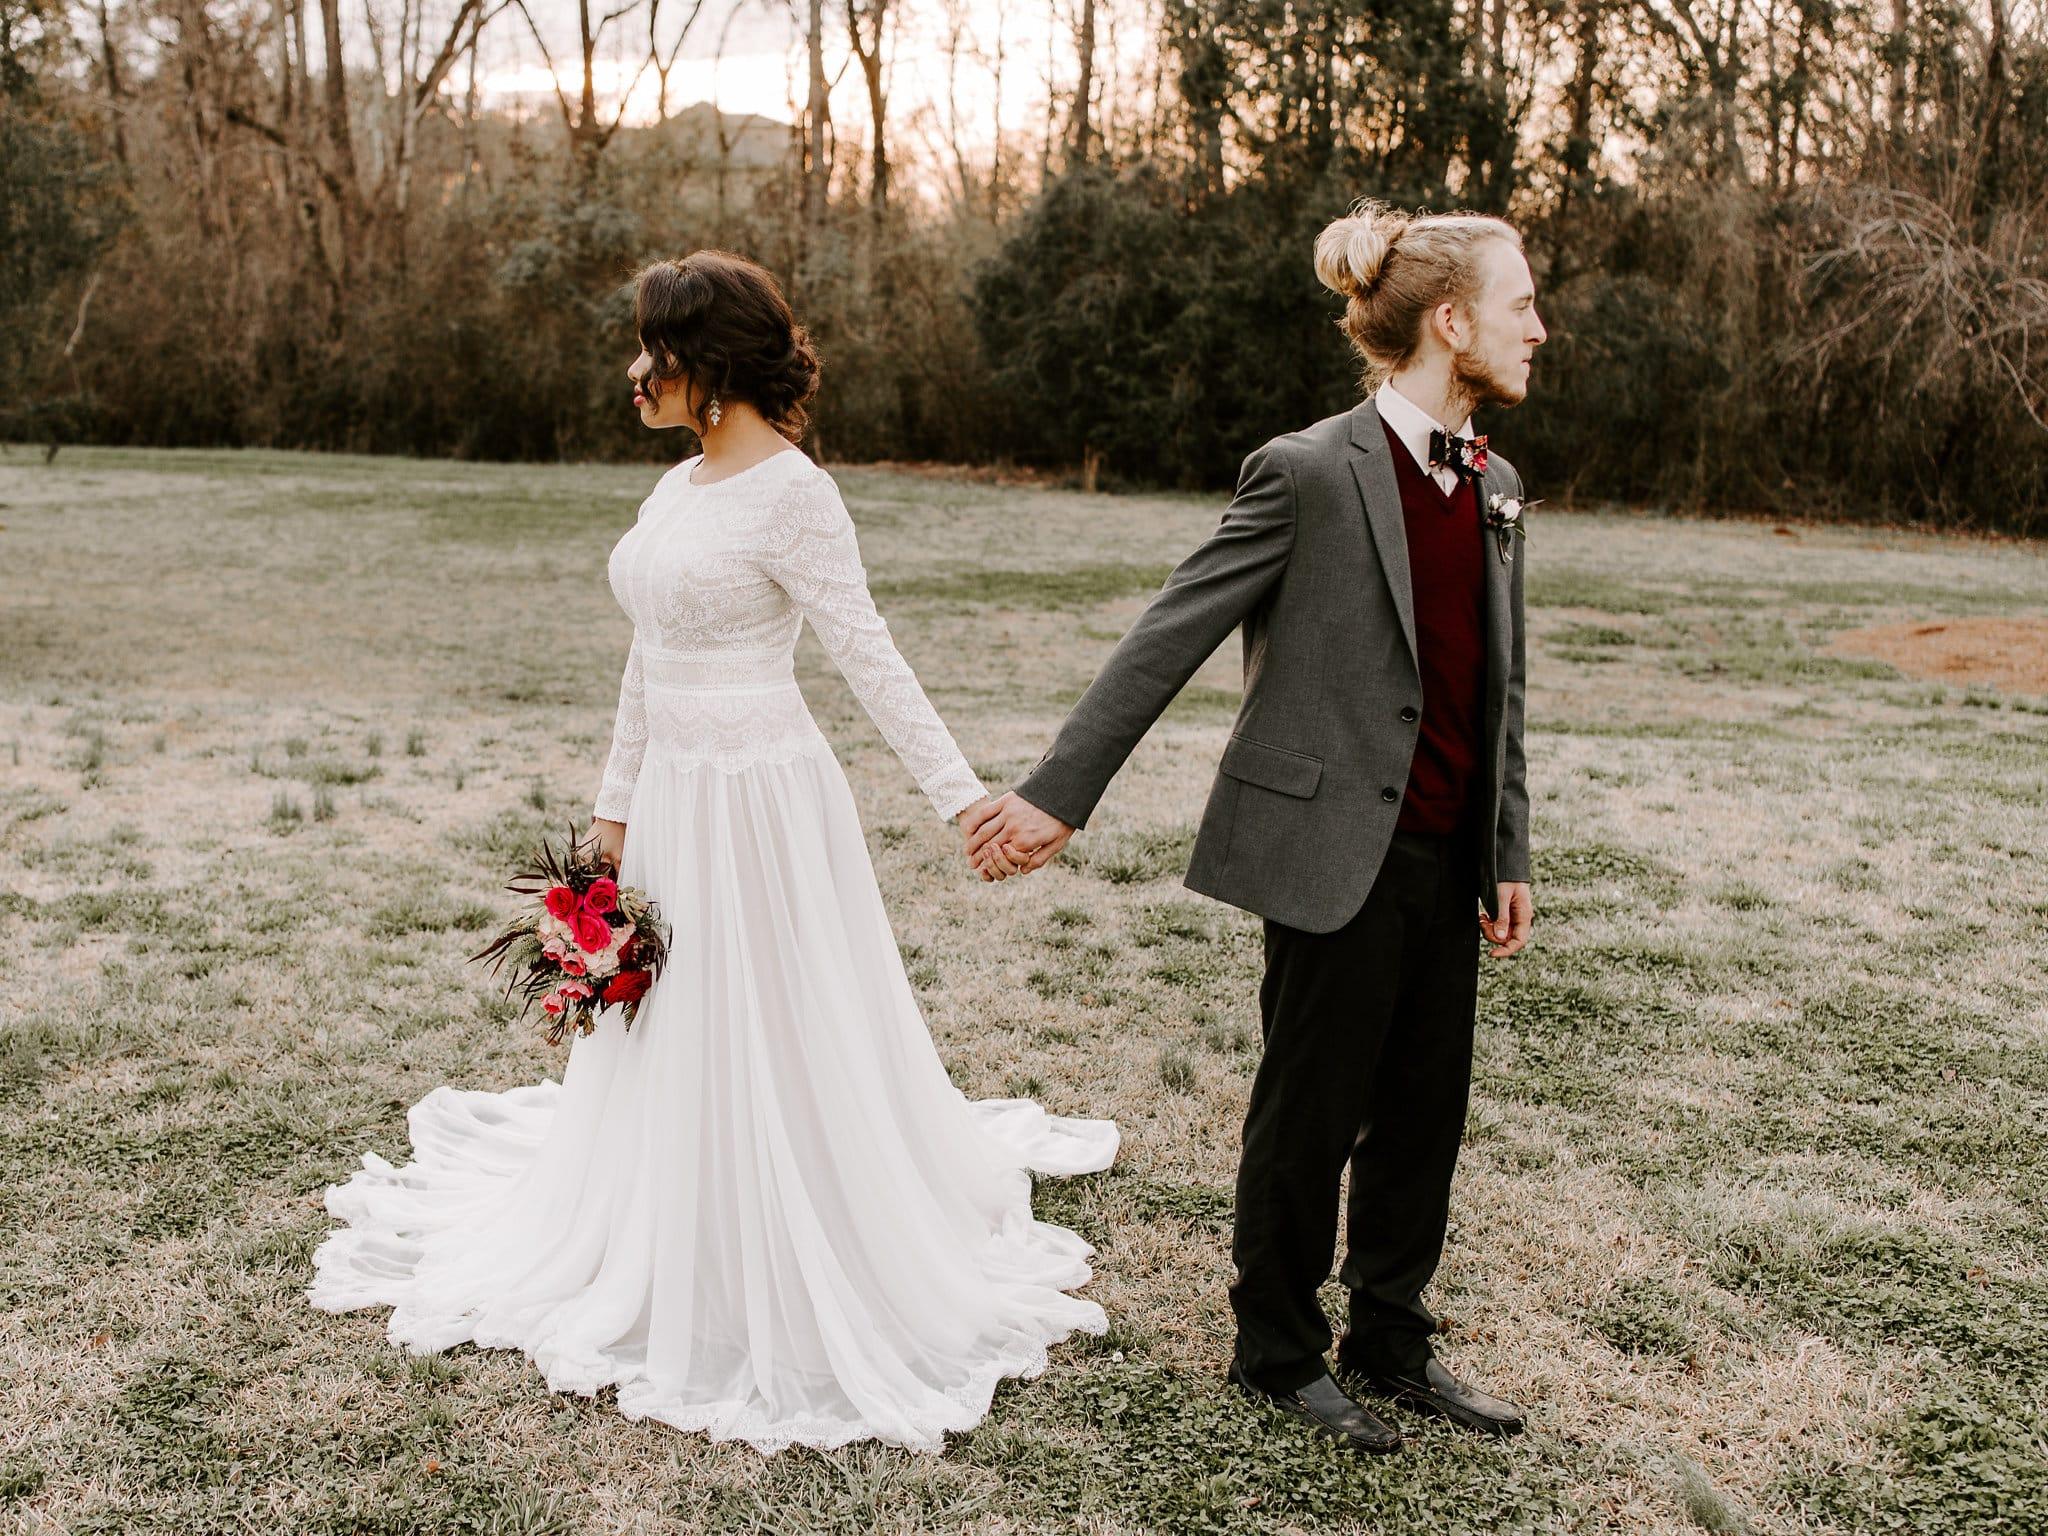 Sleeved Boho Wedding Dress in Ultra-Romantic Elopement Styled Shoot. Deirdre Marie wedding dress by Maggie Sottero.